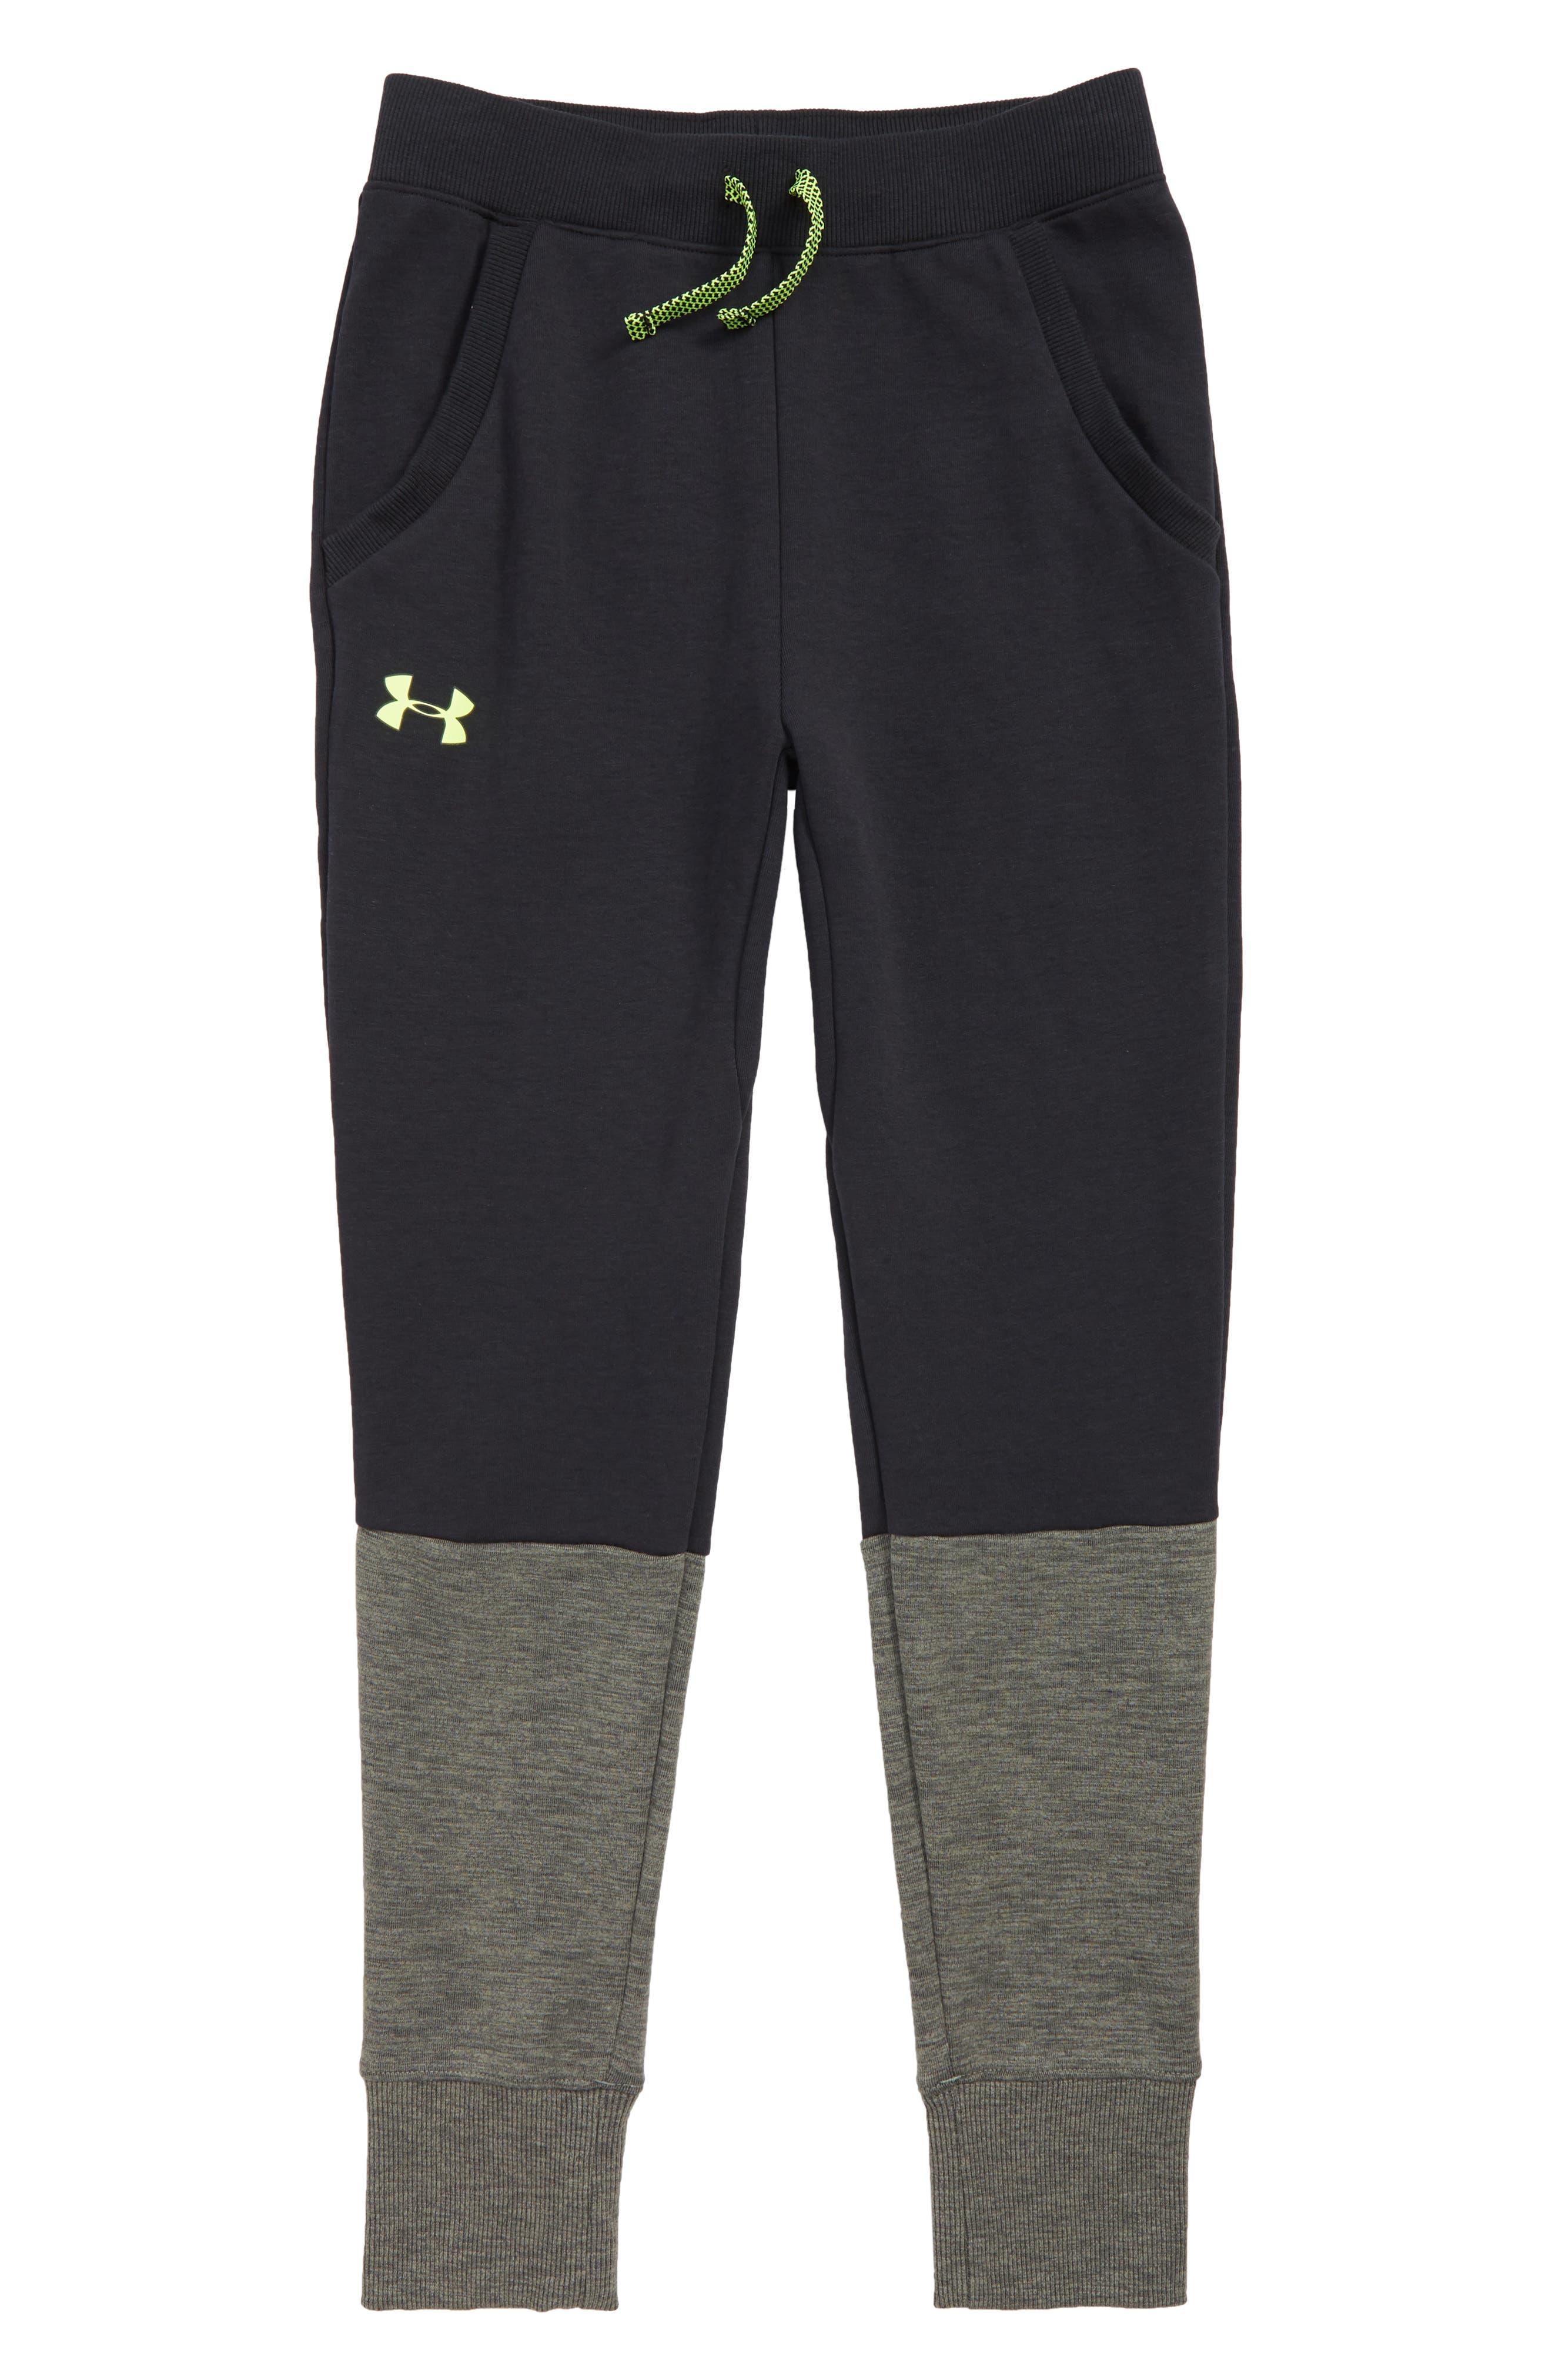 Double Knit Sweatpants,                         Main,                         color, BLACK/ YELLOW